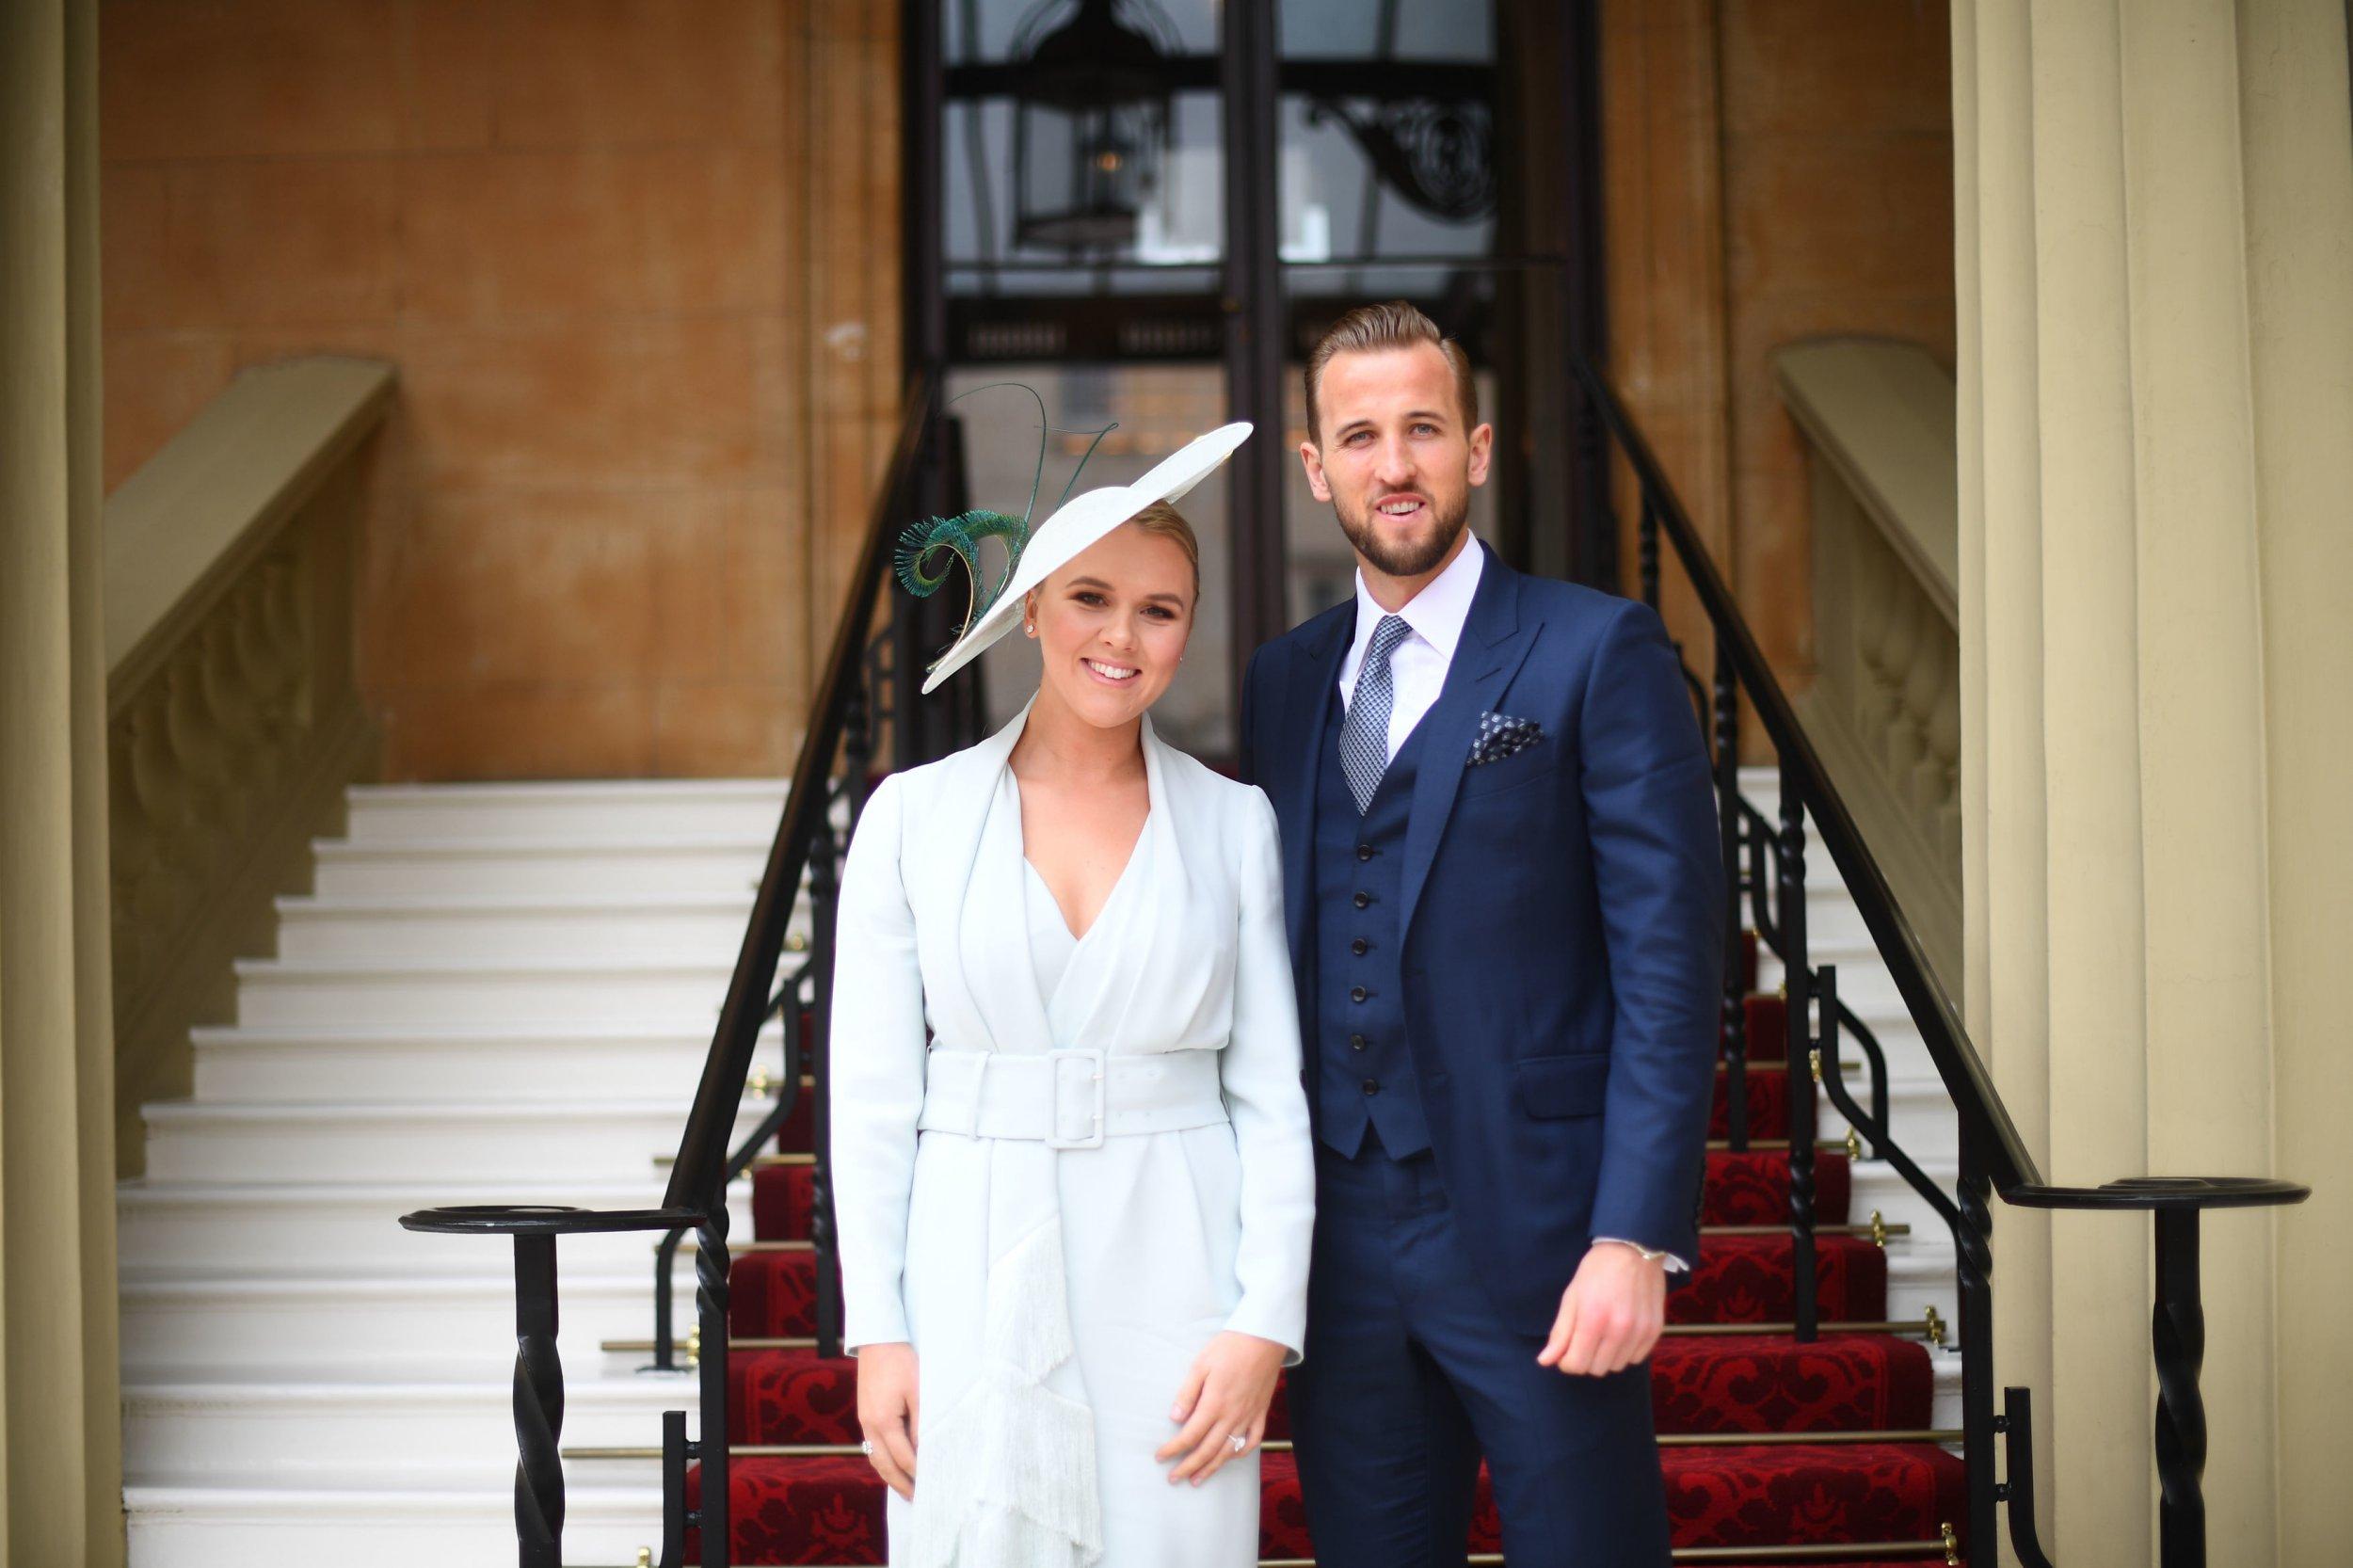 Harry Kane's fiancée Kate Goodland celebrates Spurs' Champions League win on hen do